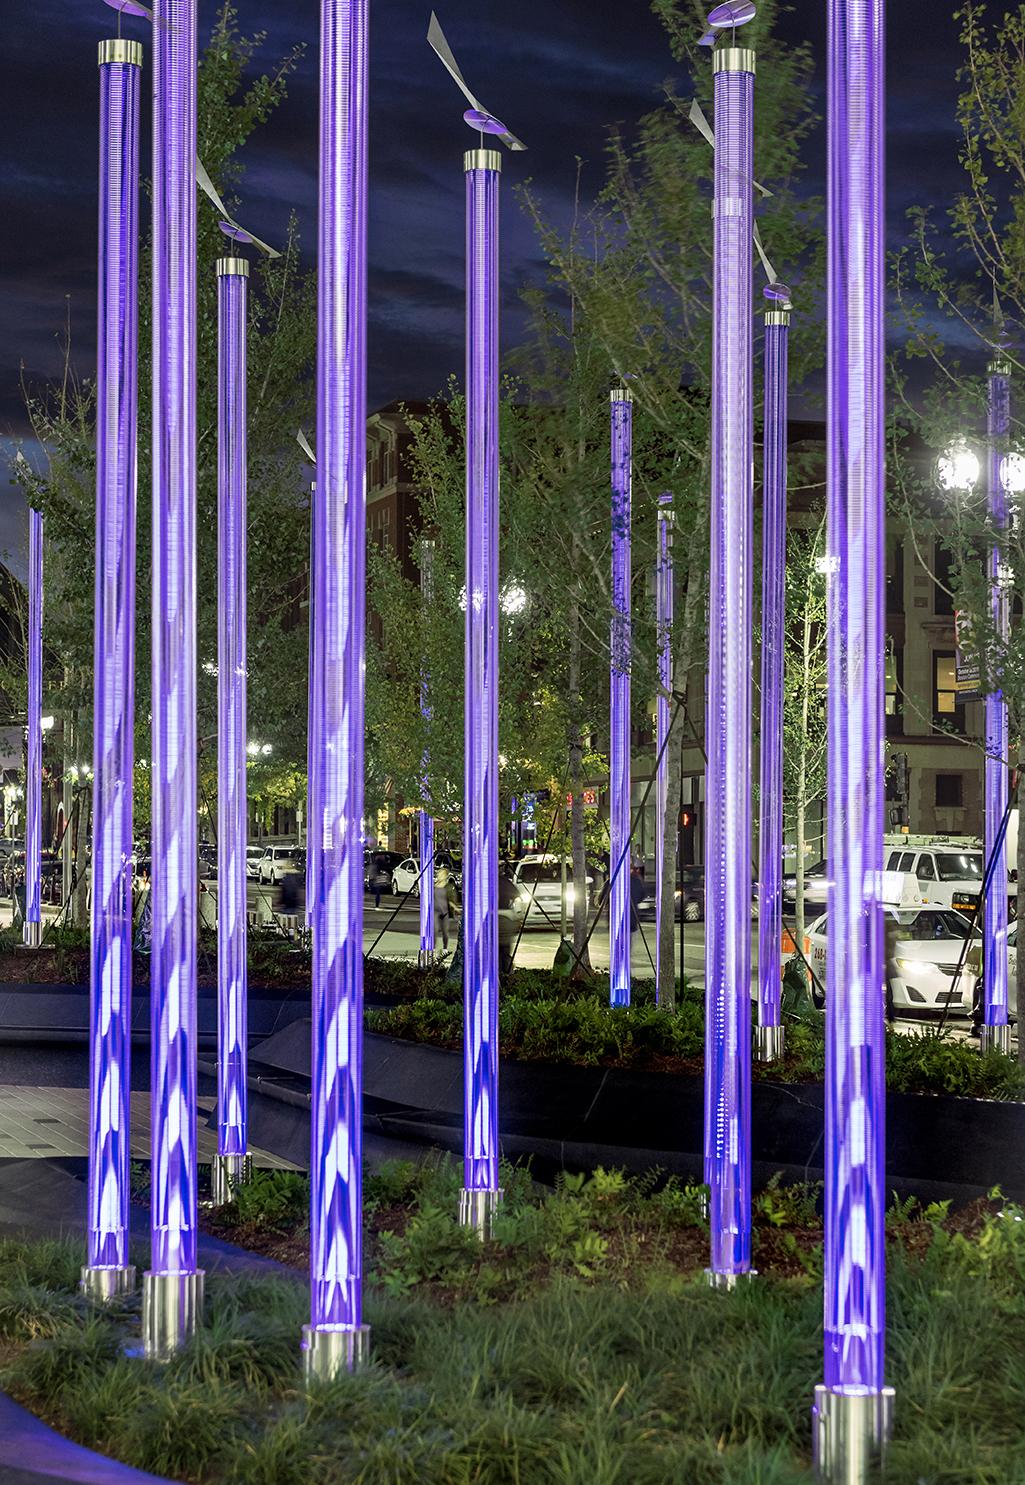 Prudential Center Plaza at 888 Boylston Street